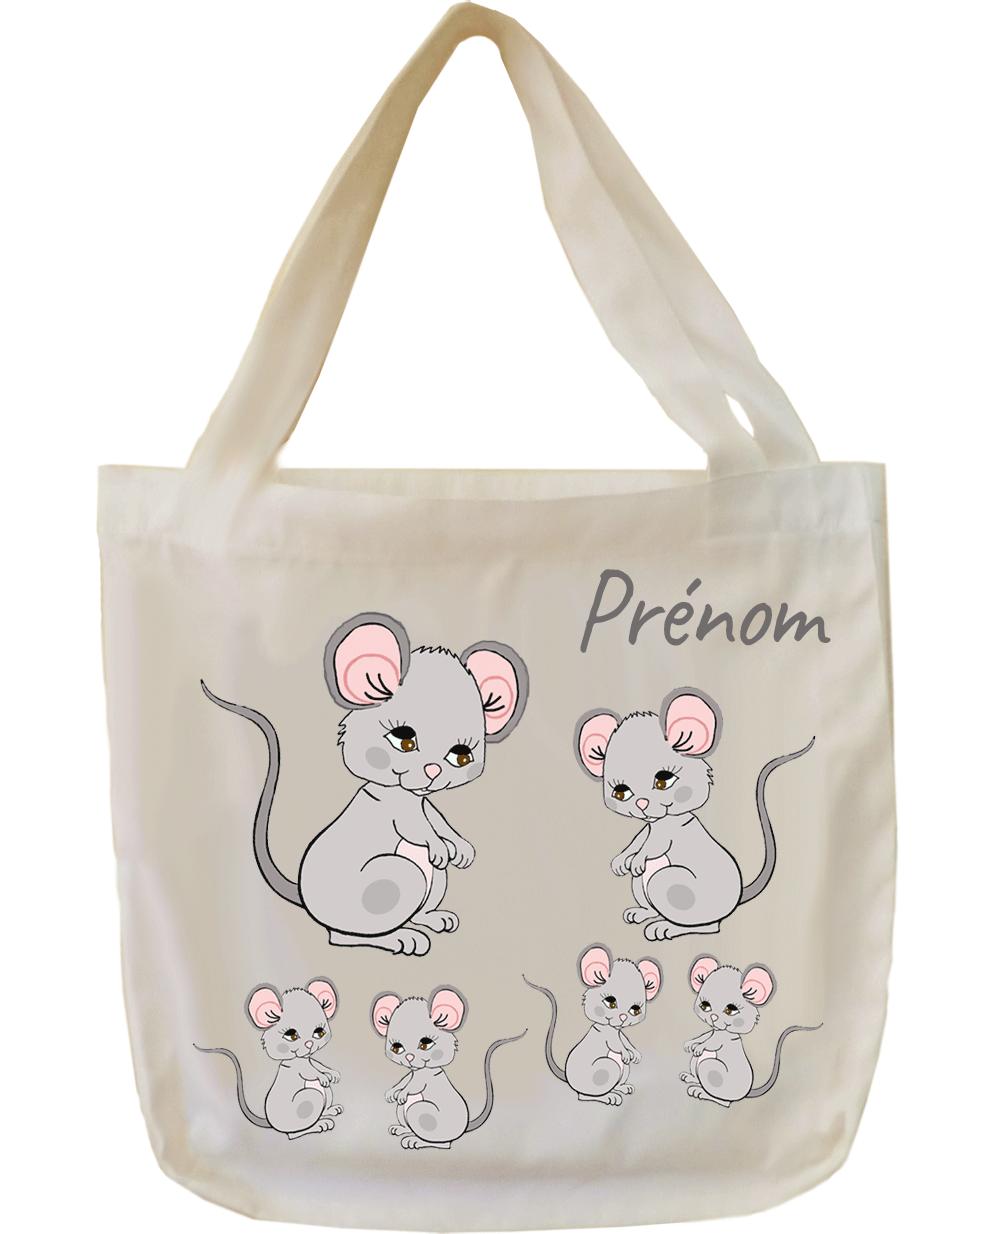 tote-bag;sac;cabas;texti;cadeaux;personnalisable;personnalisation;personnalise;prenom;animal;souris